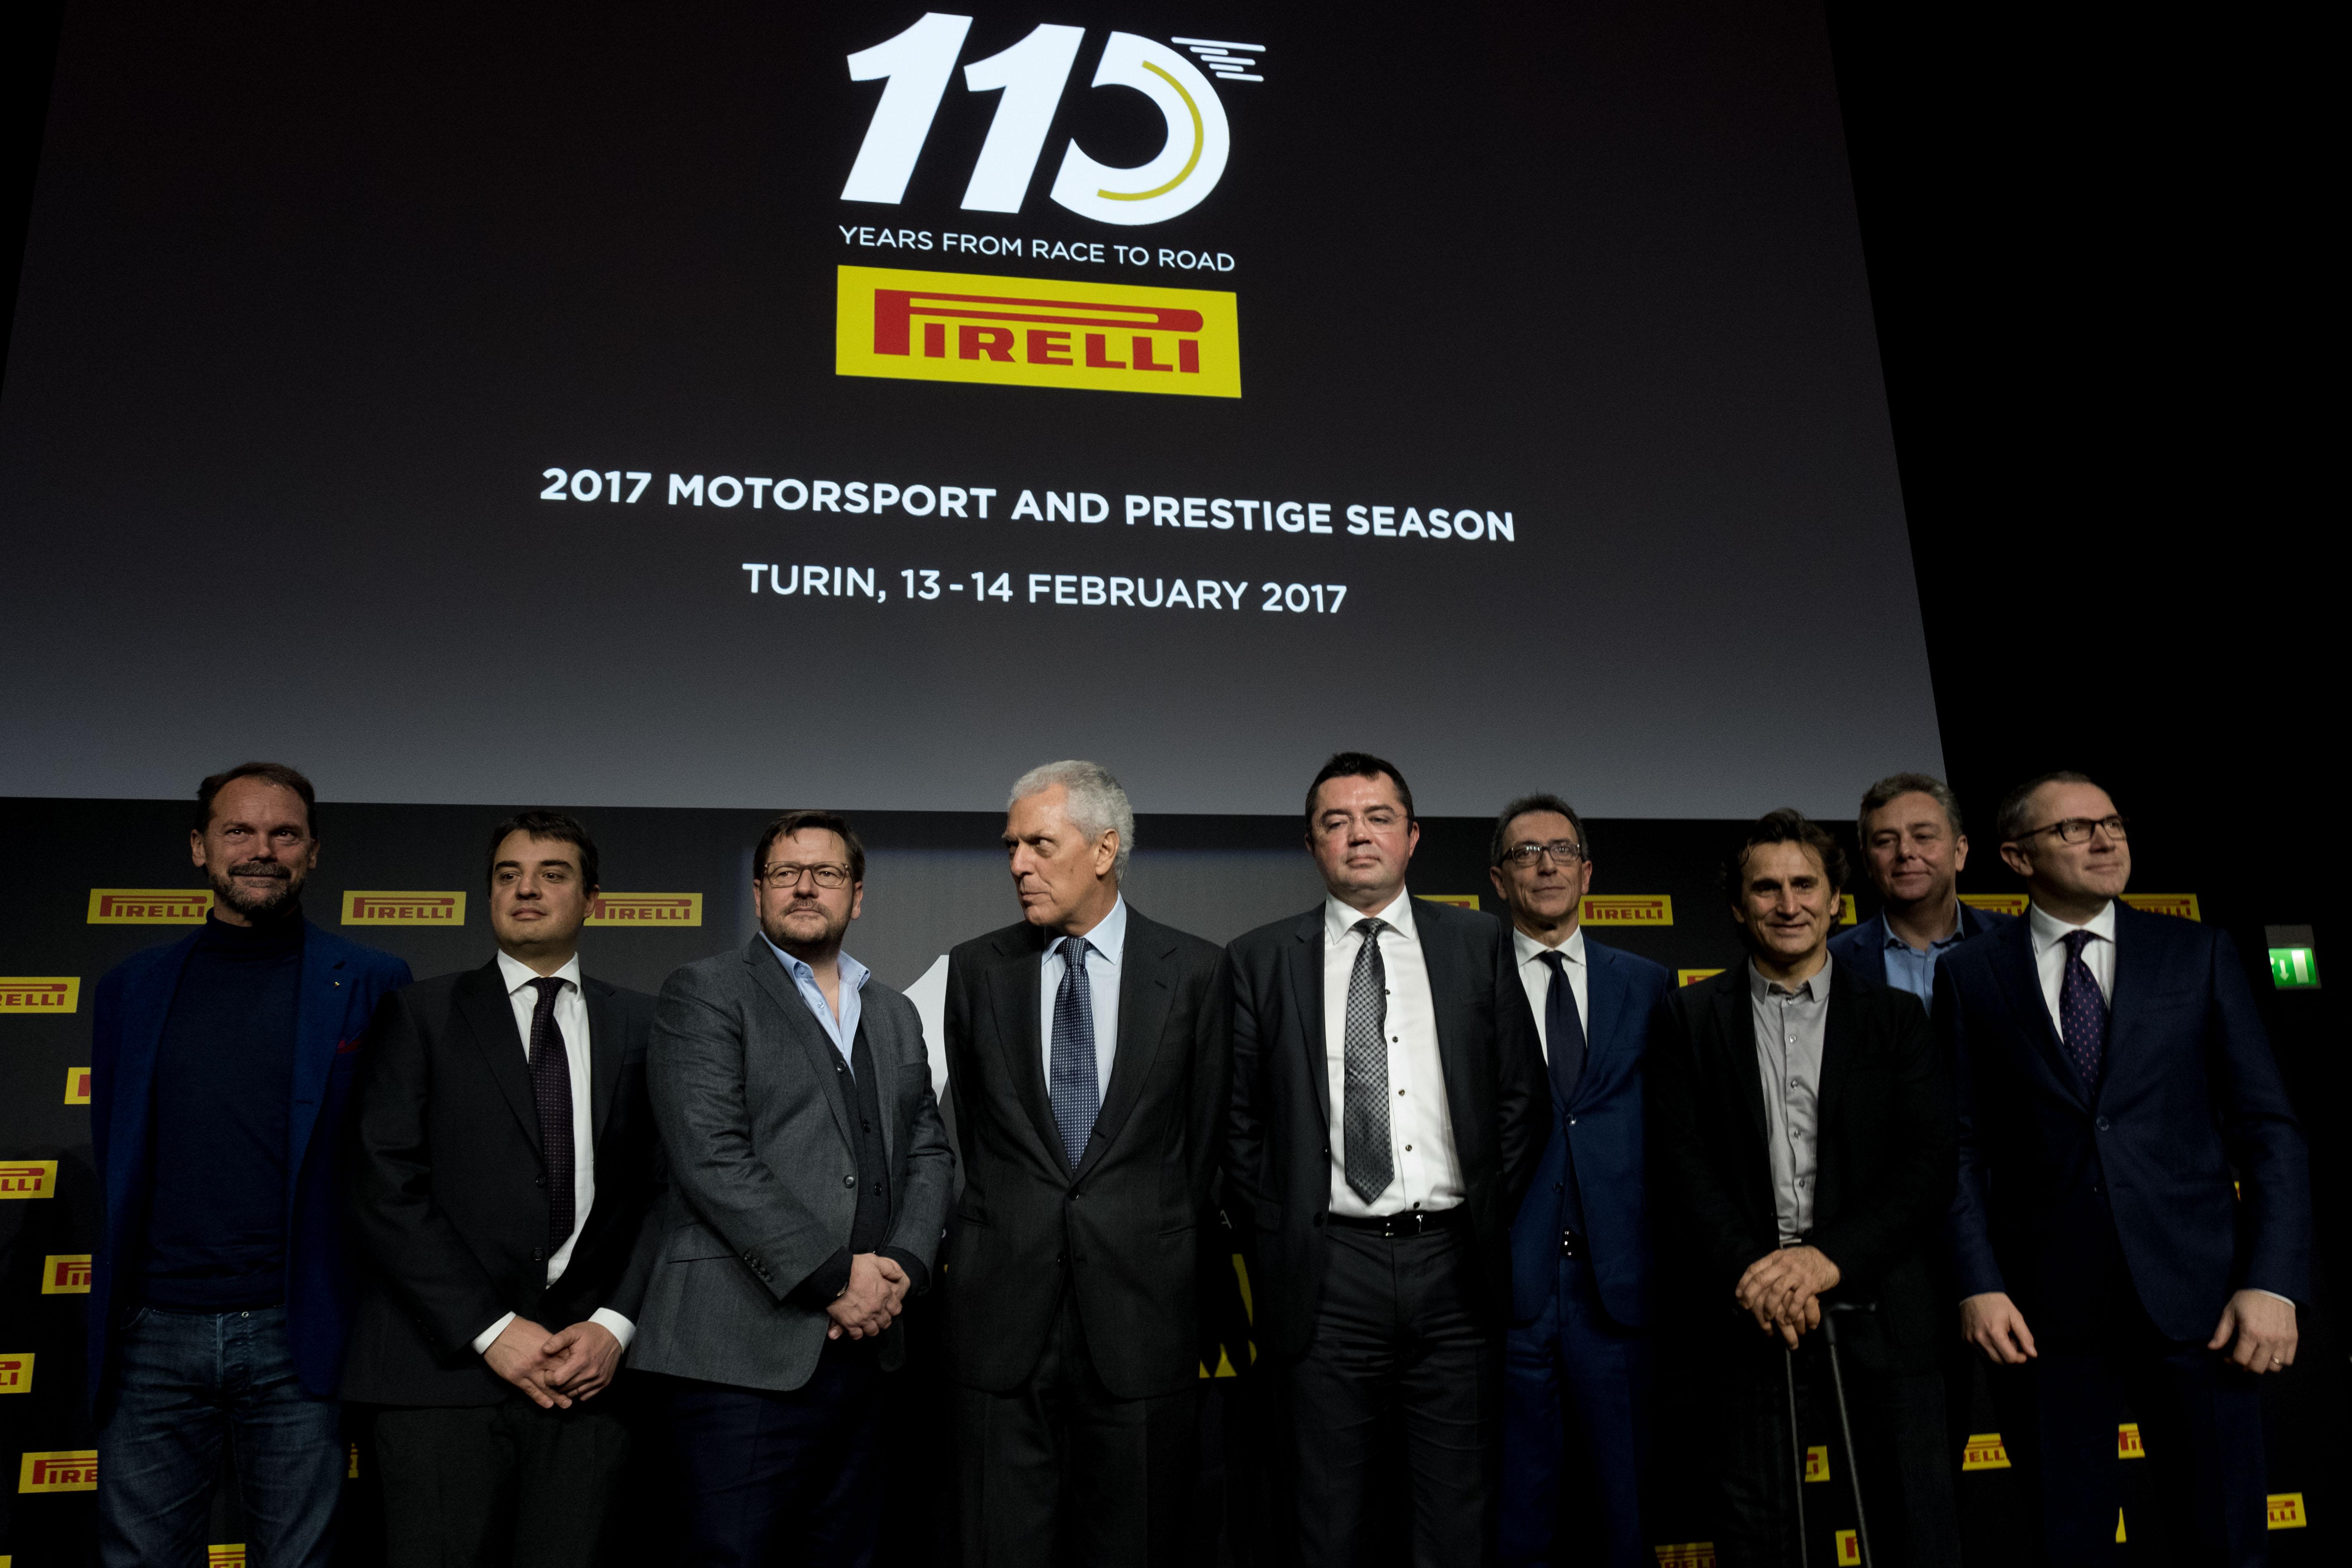 PirelliMotorsportlow-169